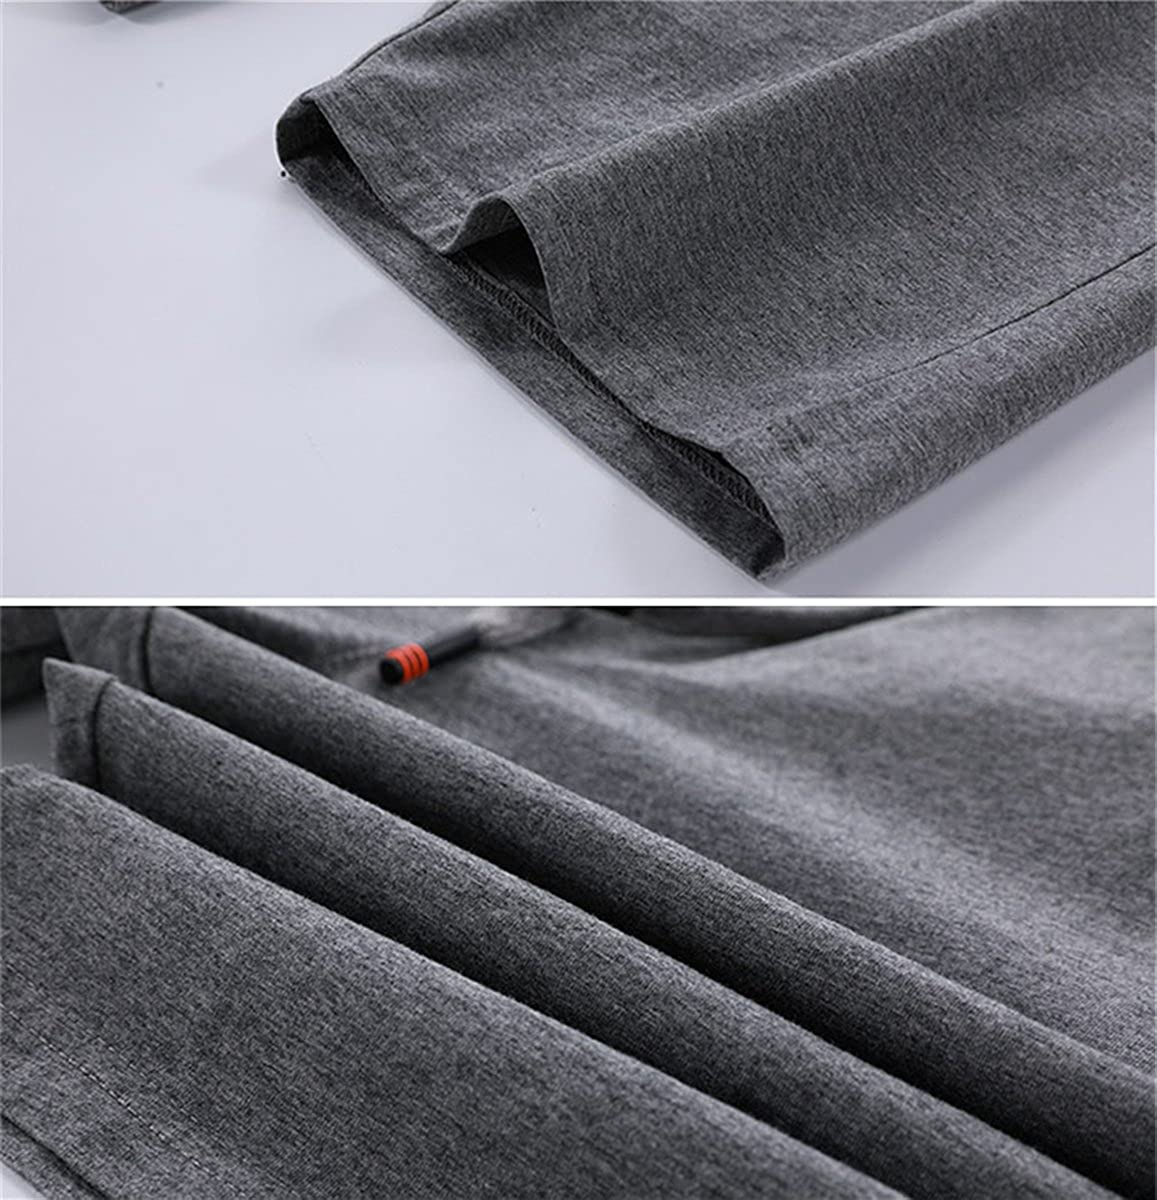 QZH.DUAO Mens Drawstring Shorts with Zipper Pockets